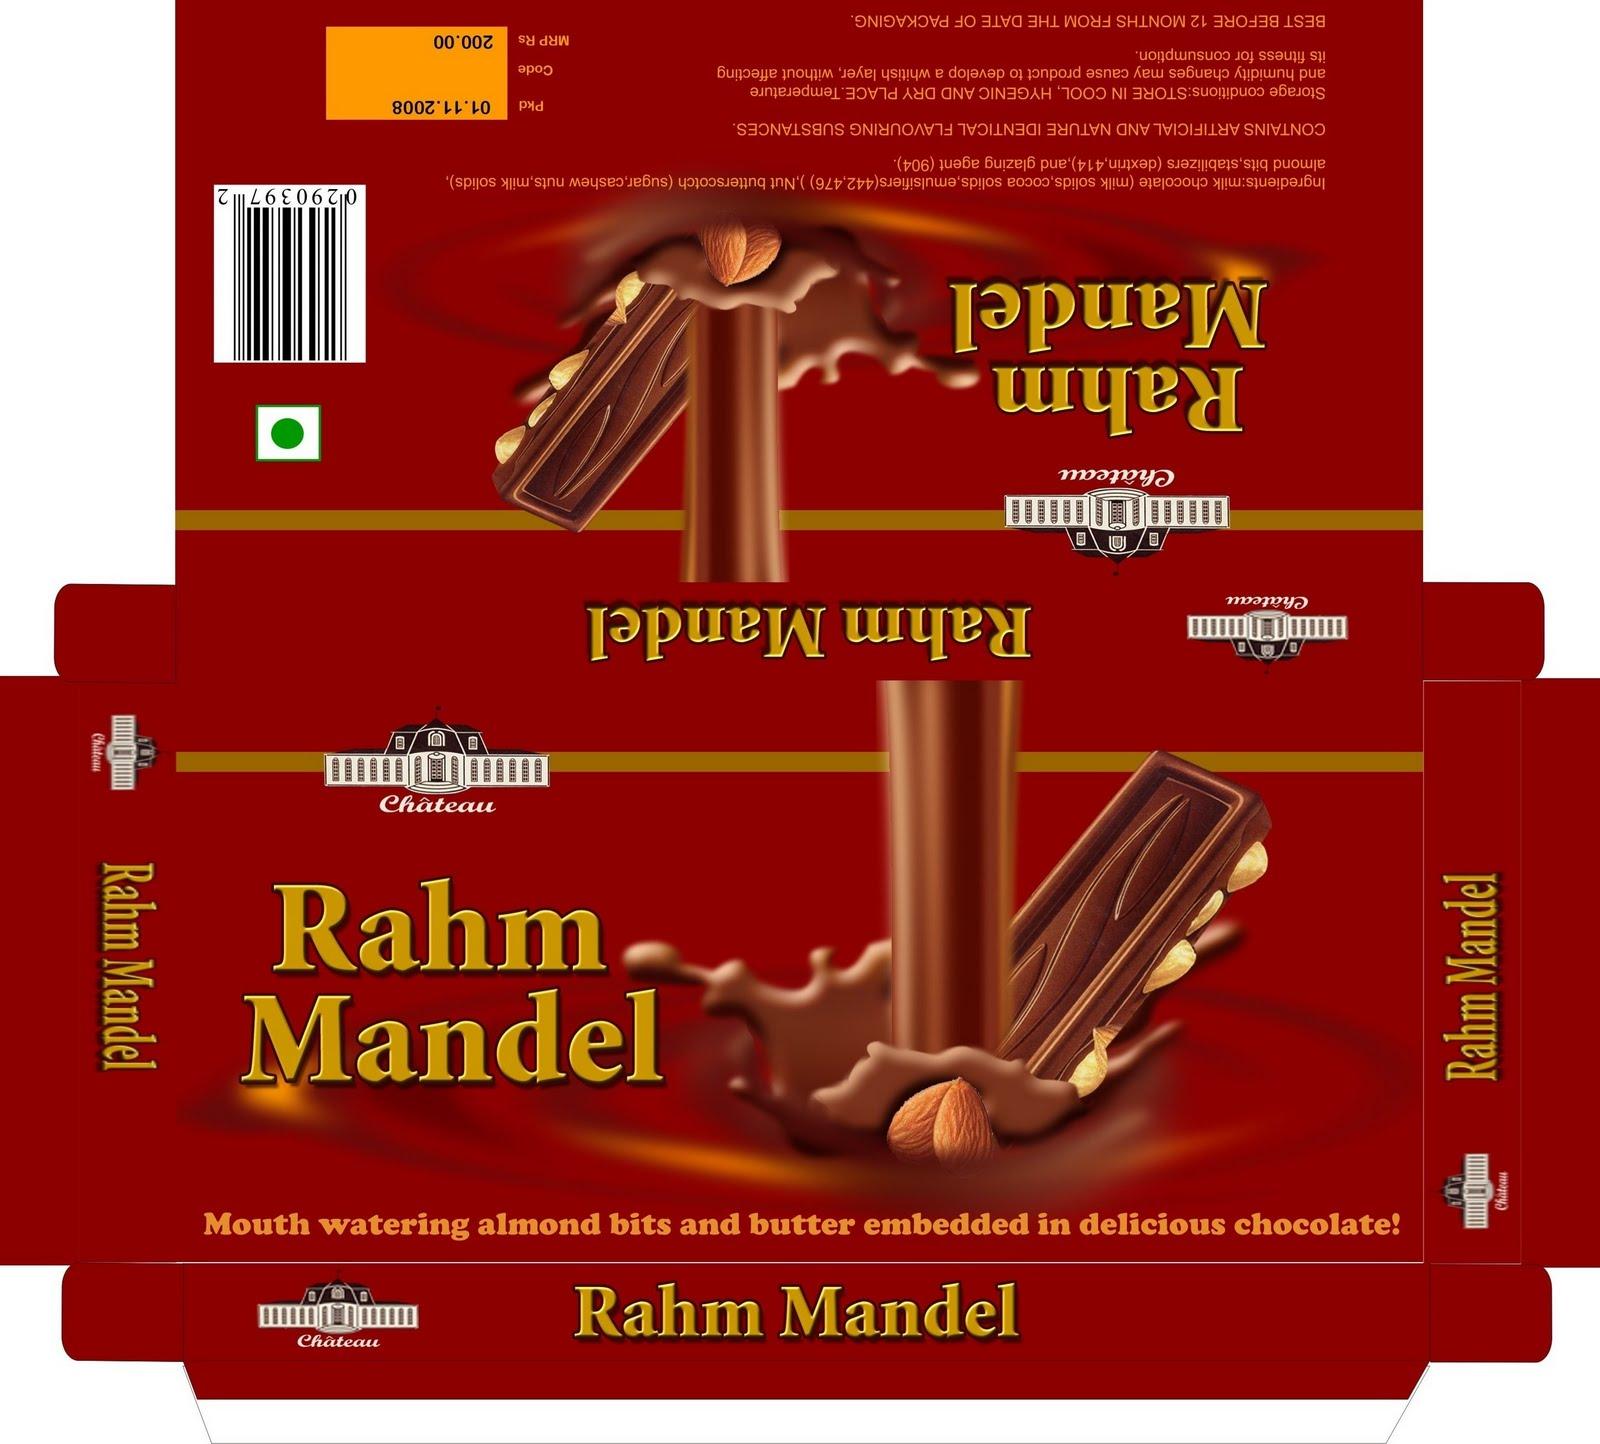 Chocolate Box Packaging Design